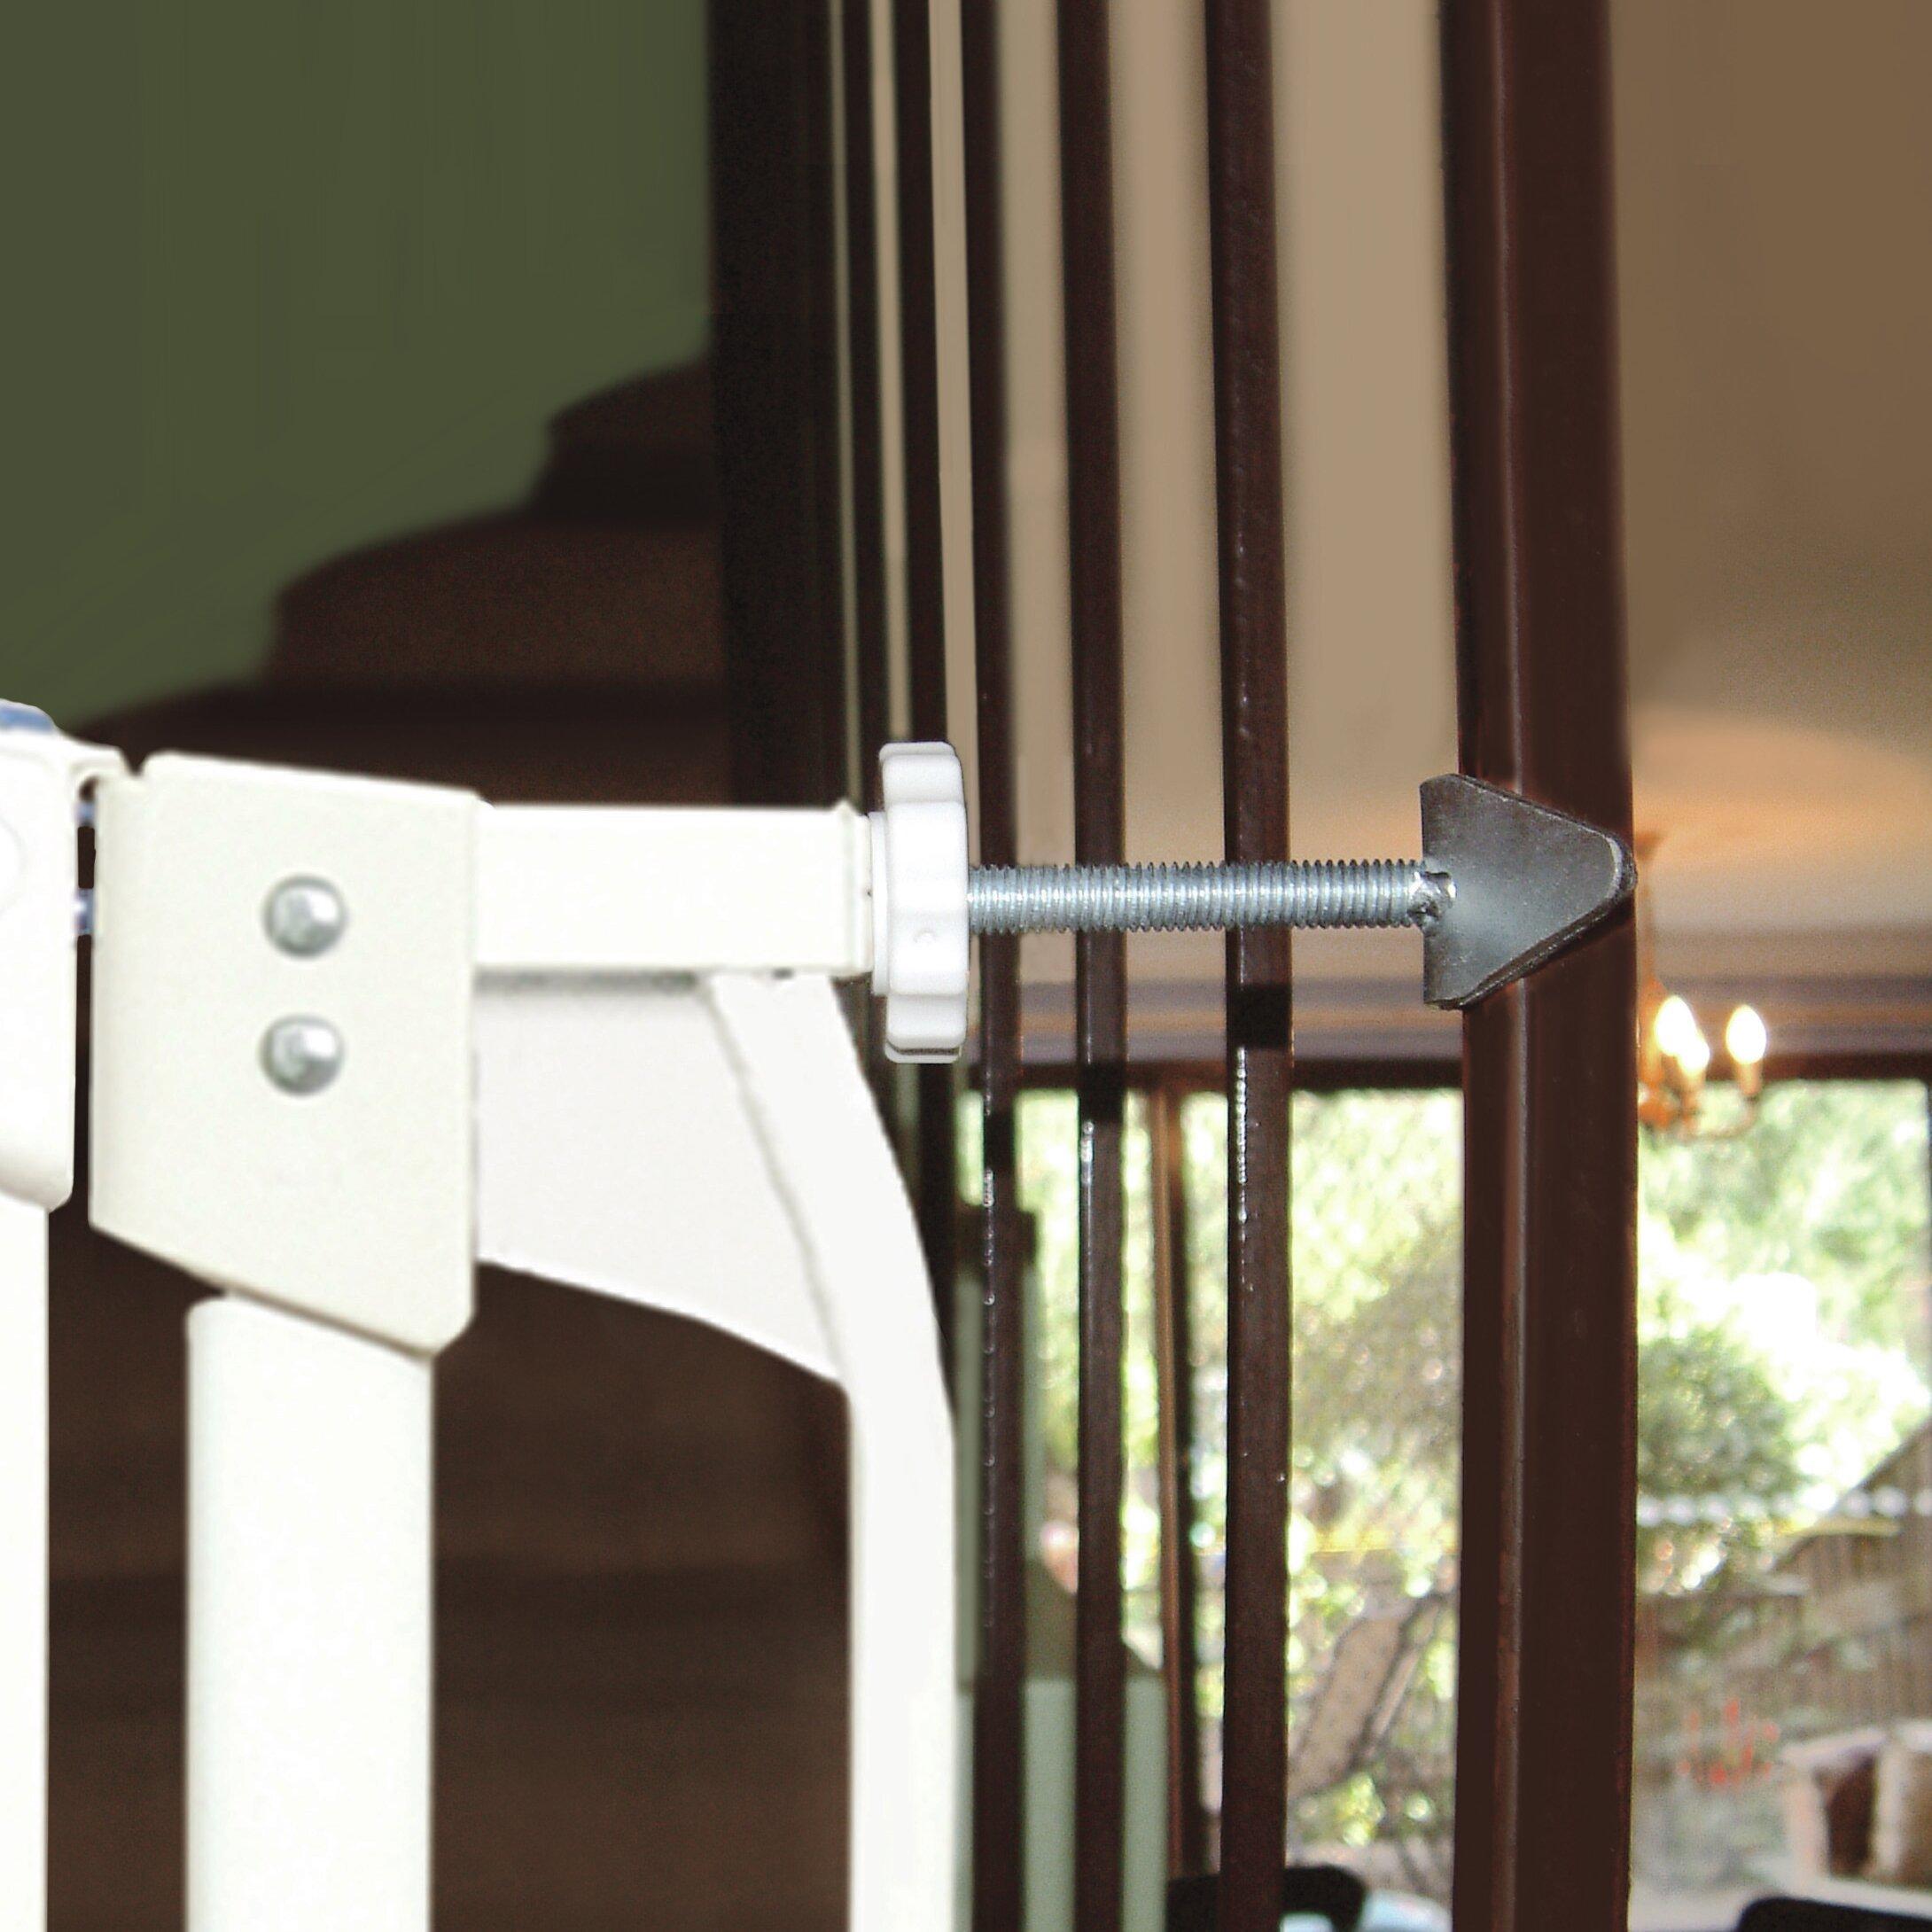 Dreambaby Banister Gate Adaptors & Reviews